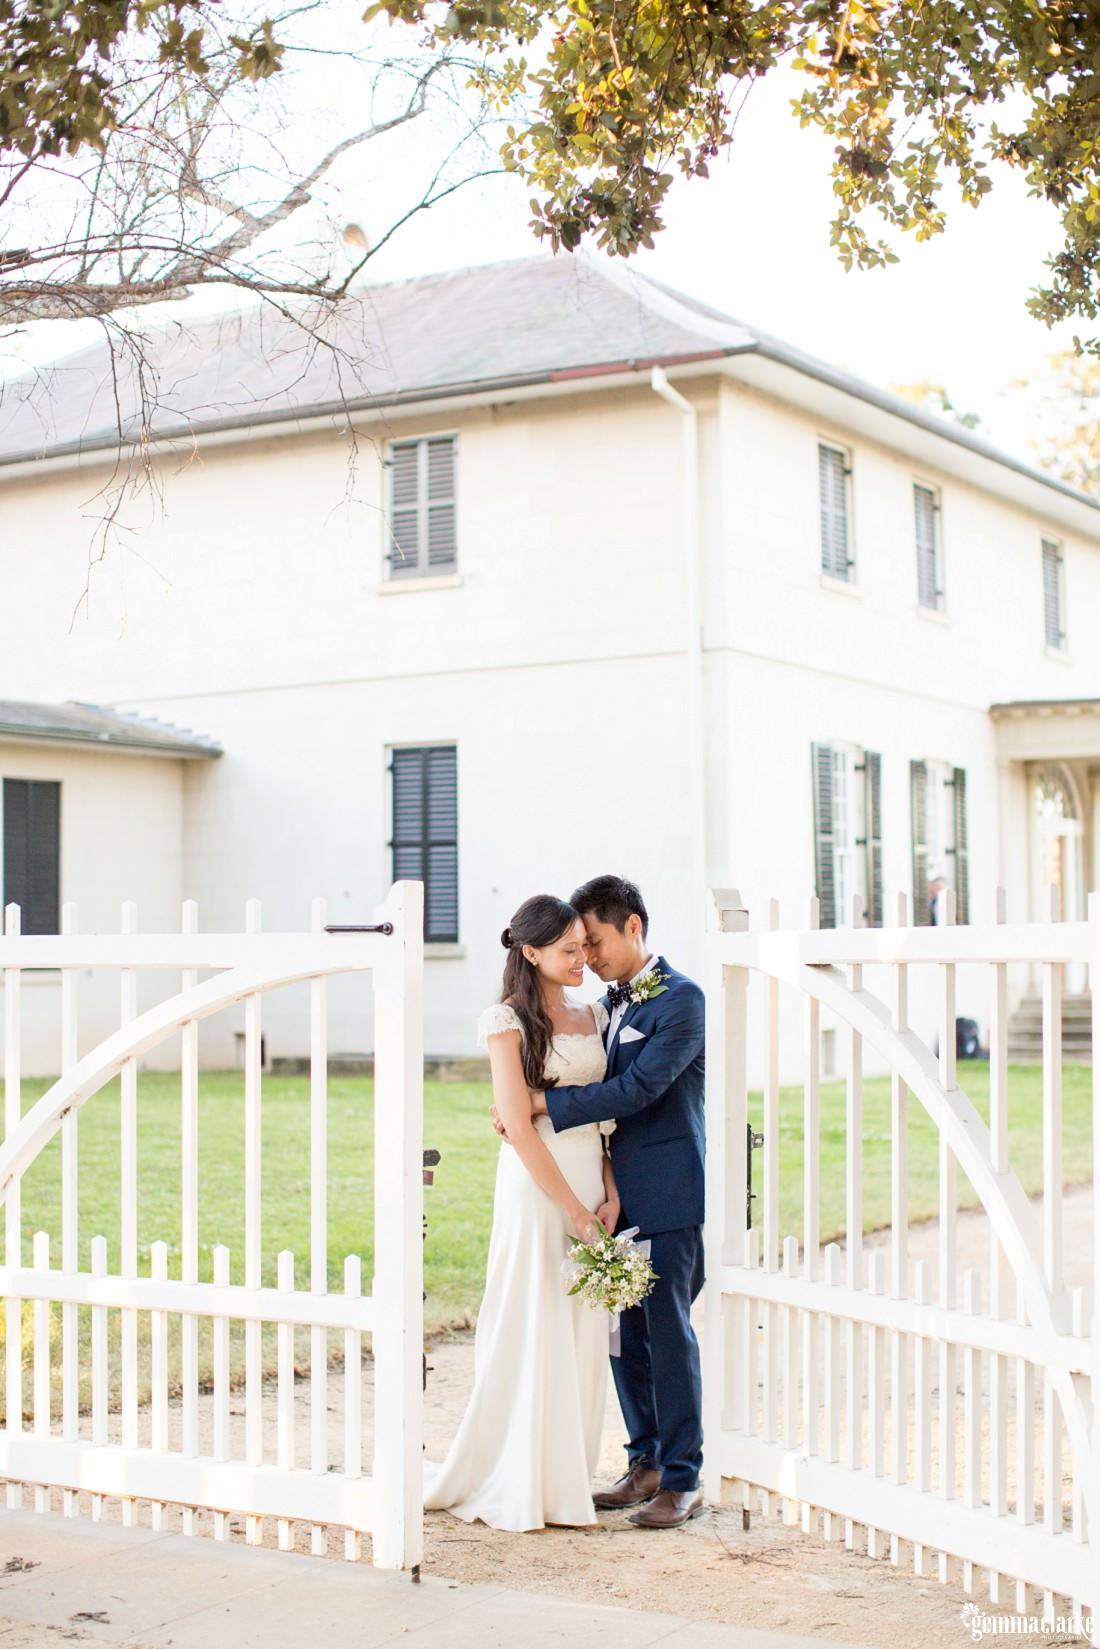 gemma-clarke-photography_parramatta-park-wedding-photos_old-government-house-reception_kamille-and-sam_0051